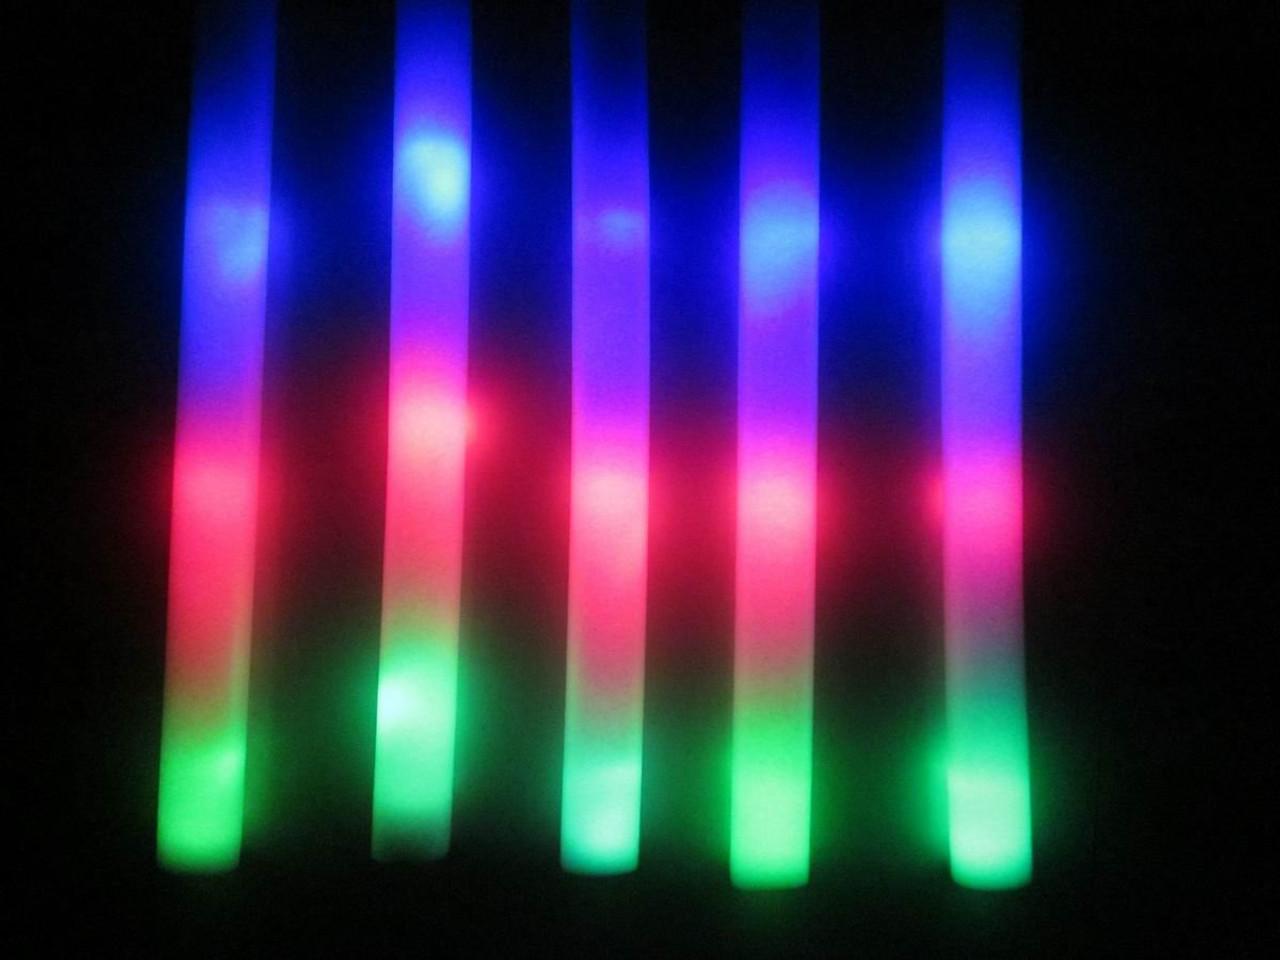 LED, FOAM, lite, light, sticks, stix, club, rave, party, dance, custom party batons, custom party sticks, led foam sticks, led sticks, led batons, party custom sticks, nightclub foam sticks, nightclub batons, foam sticks, foam party sticks, custom party sticks, led foam, led glow sticks, led custom glow sticks, custom, glow sticks, glow party sticks, customized